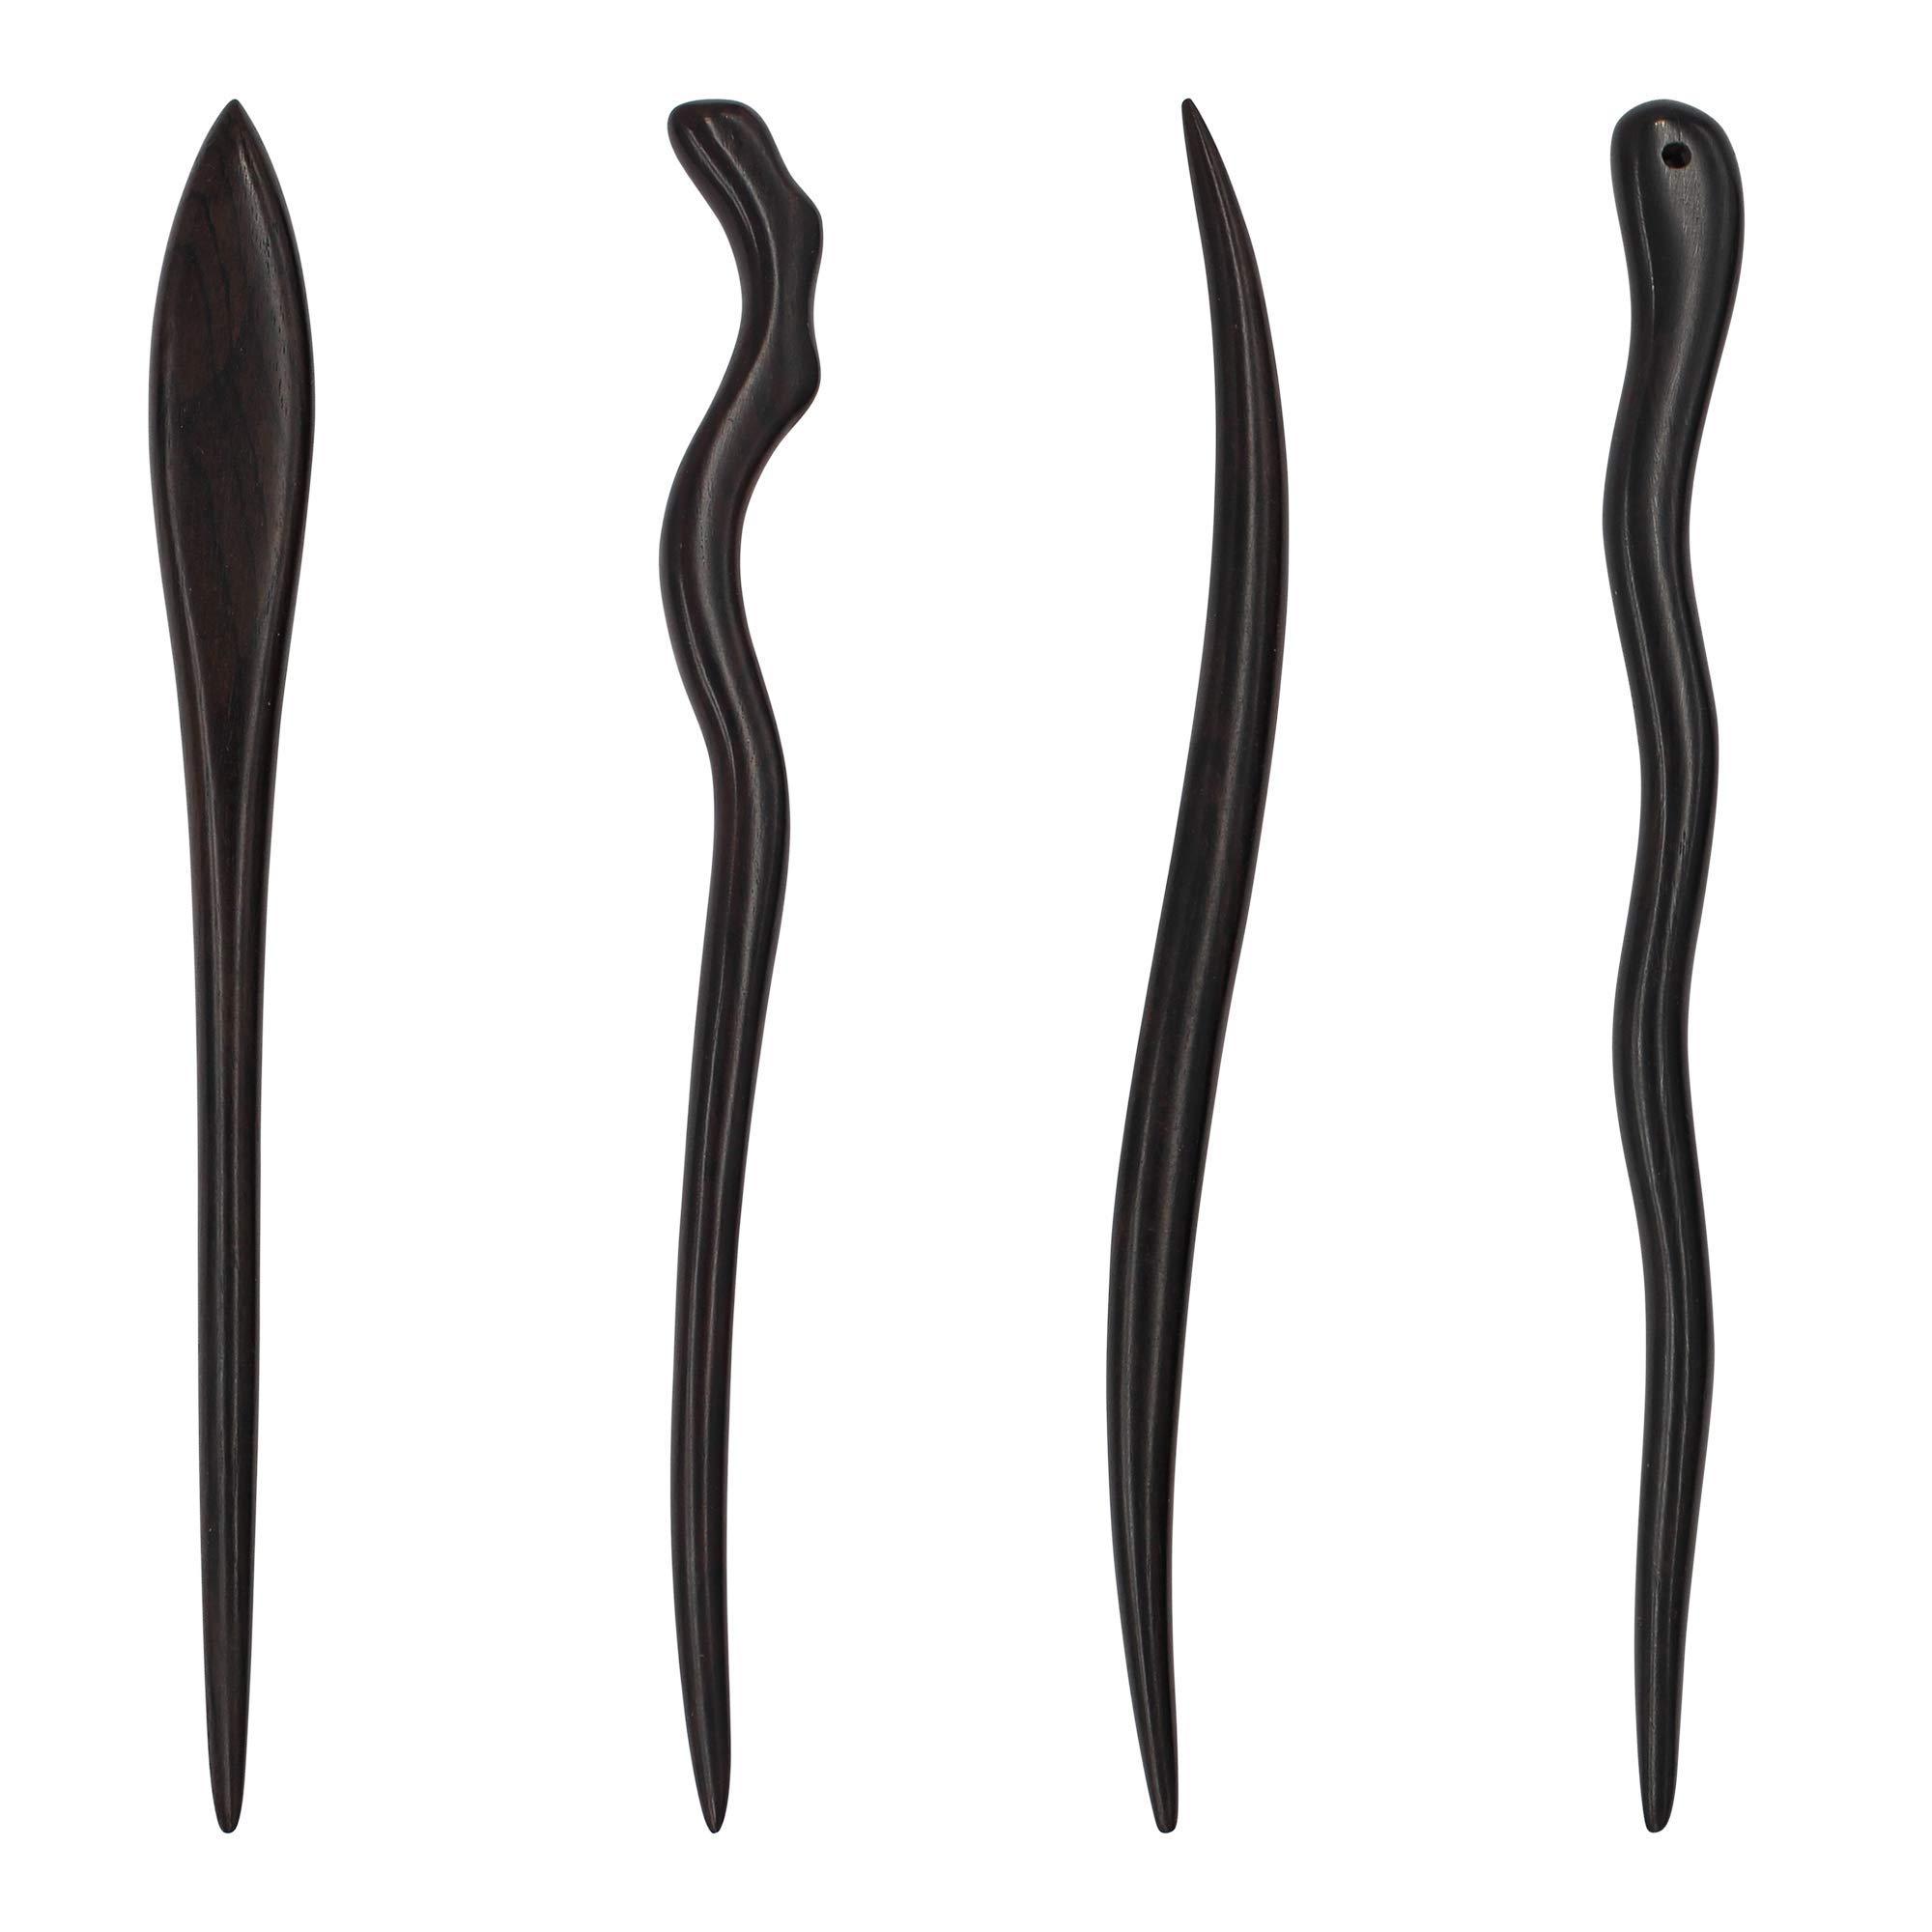 REAL SIC - Natural Sandalwood Hair Sticks for Women - Set of 4 - Sustainable Retro Boho Fashion Chopsticks/Wood Hair Pins for Long Hair (Adventure Set)